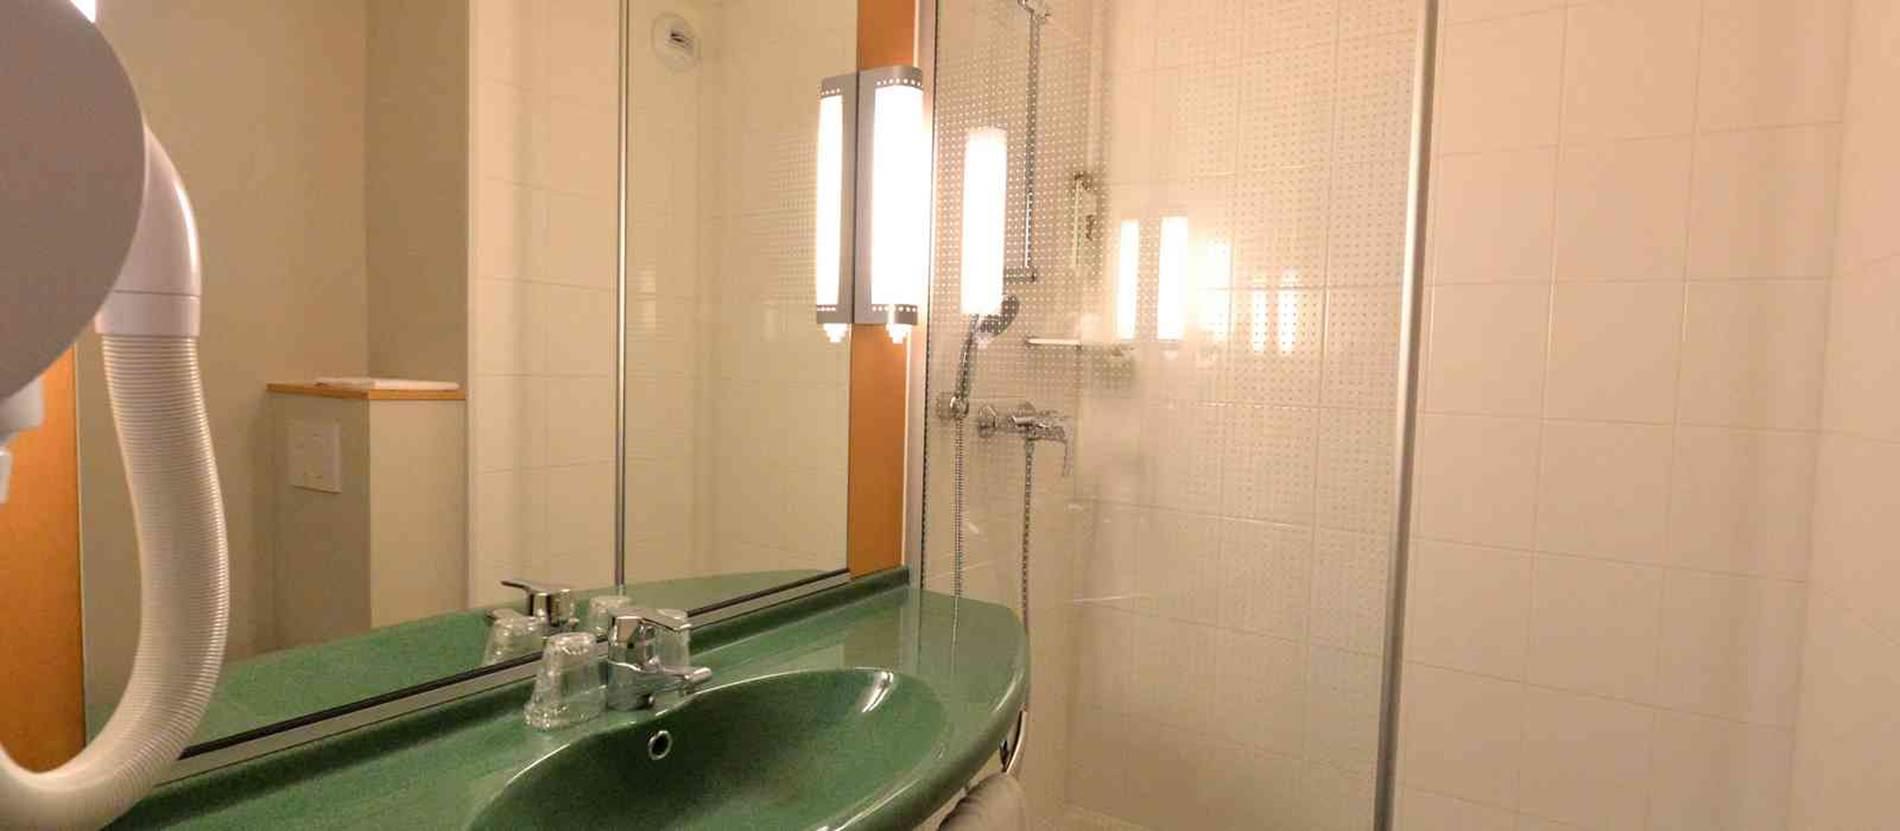 hotel-ibis-auray-salle-d'eau © hotel-ibis